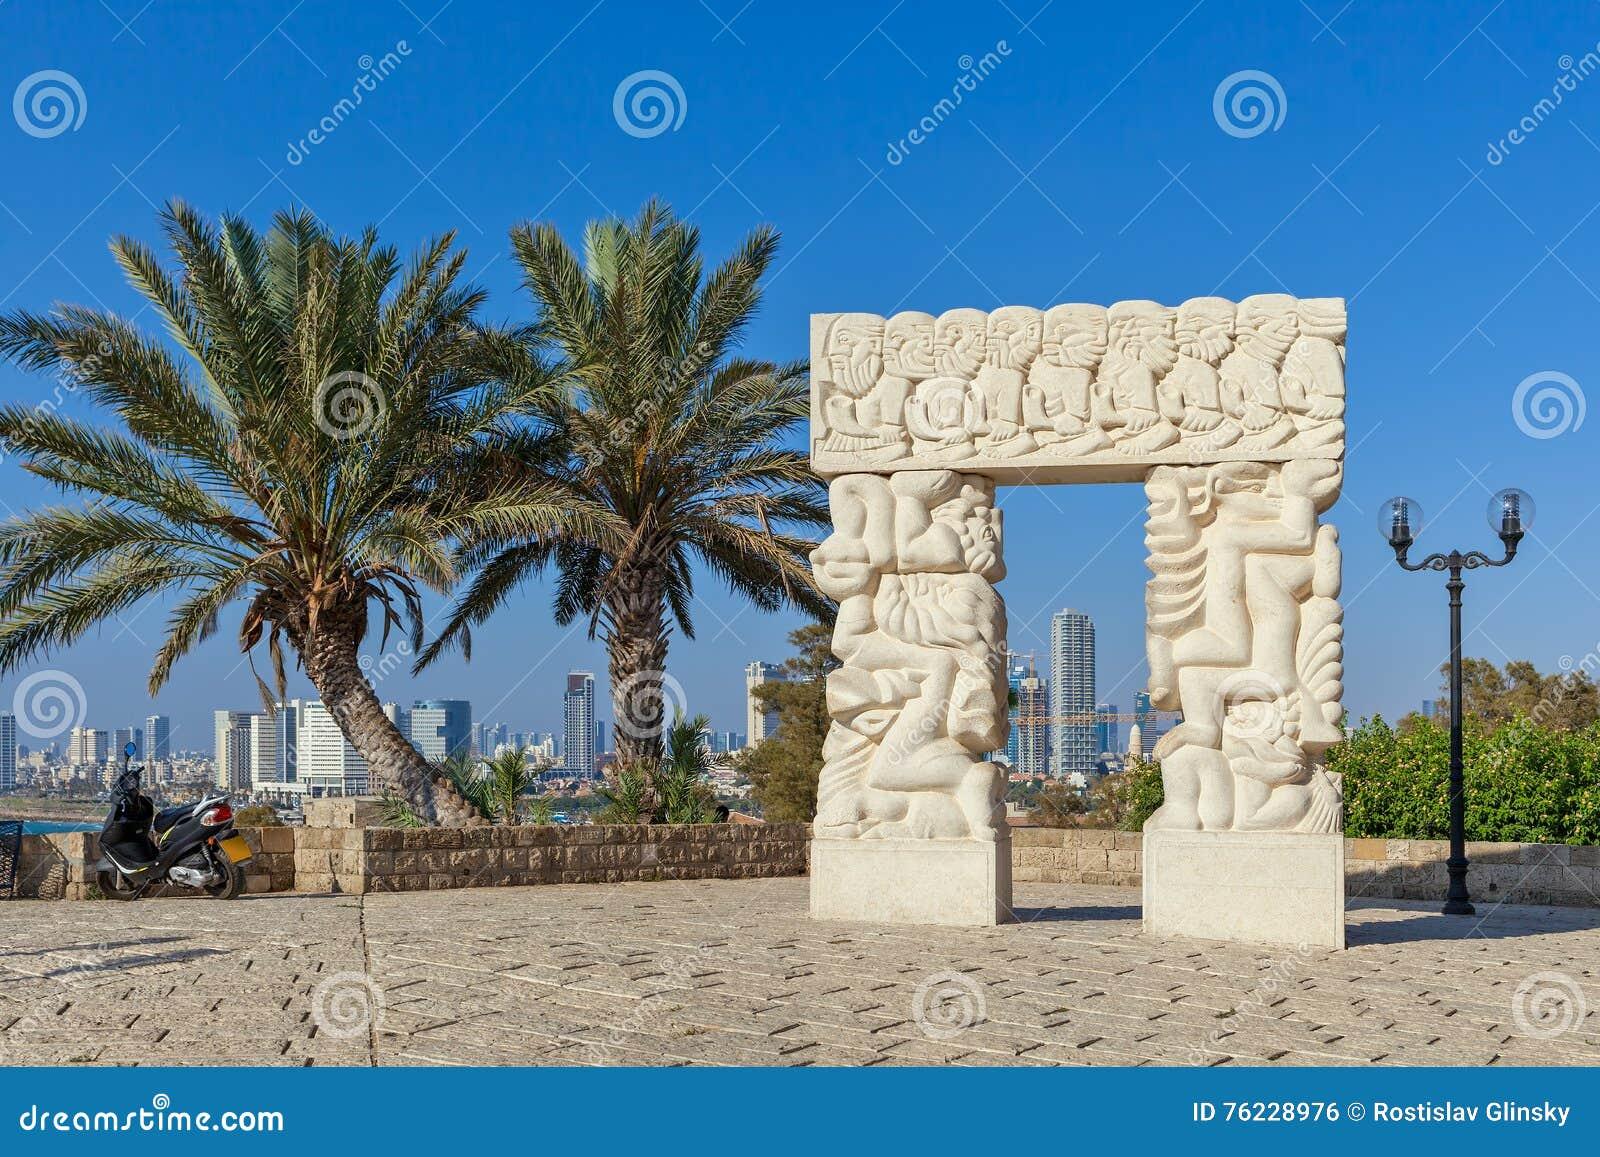 Statue of Faith in Old Jaffa.